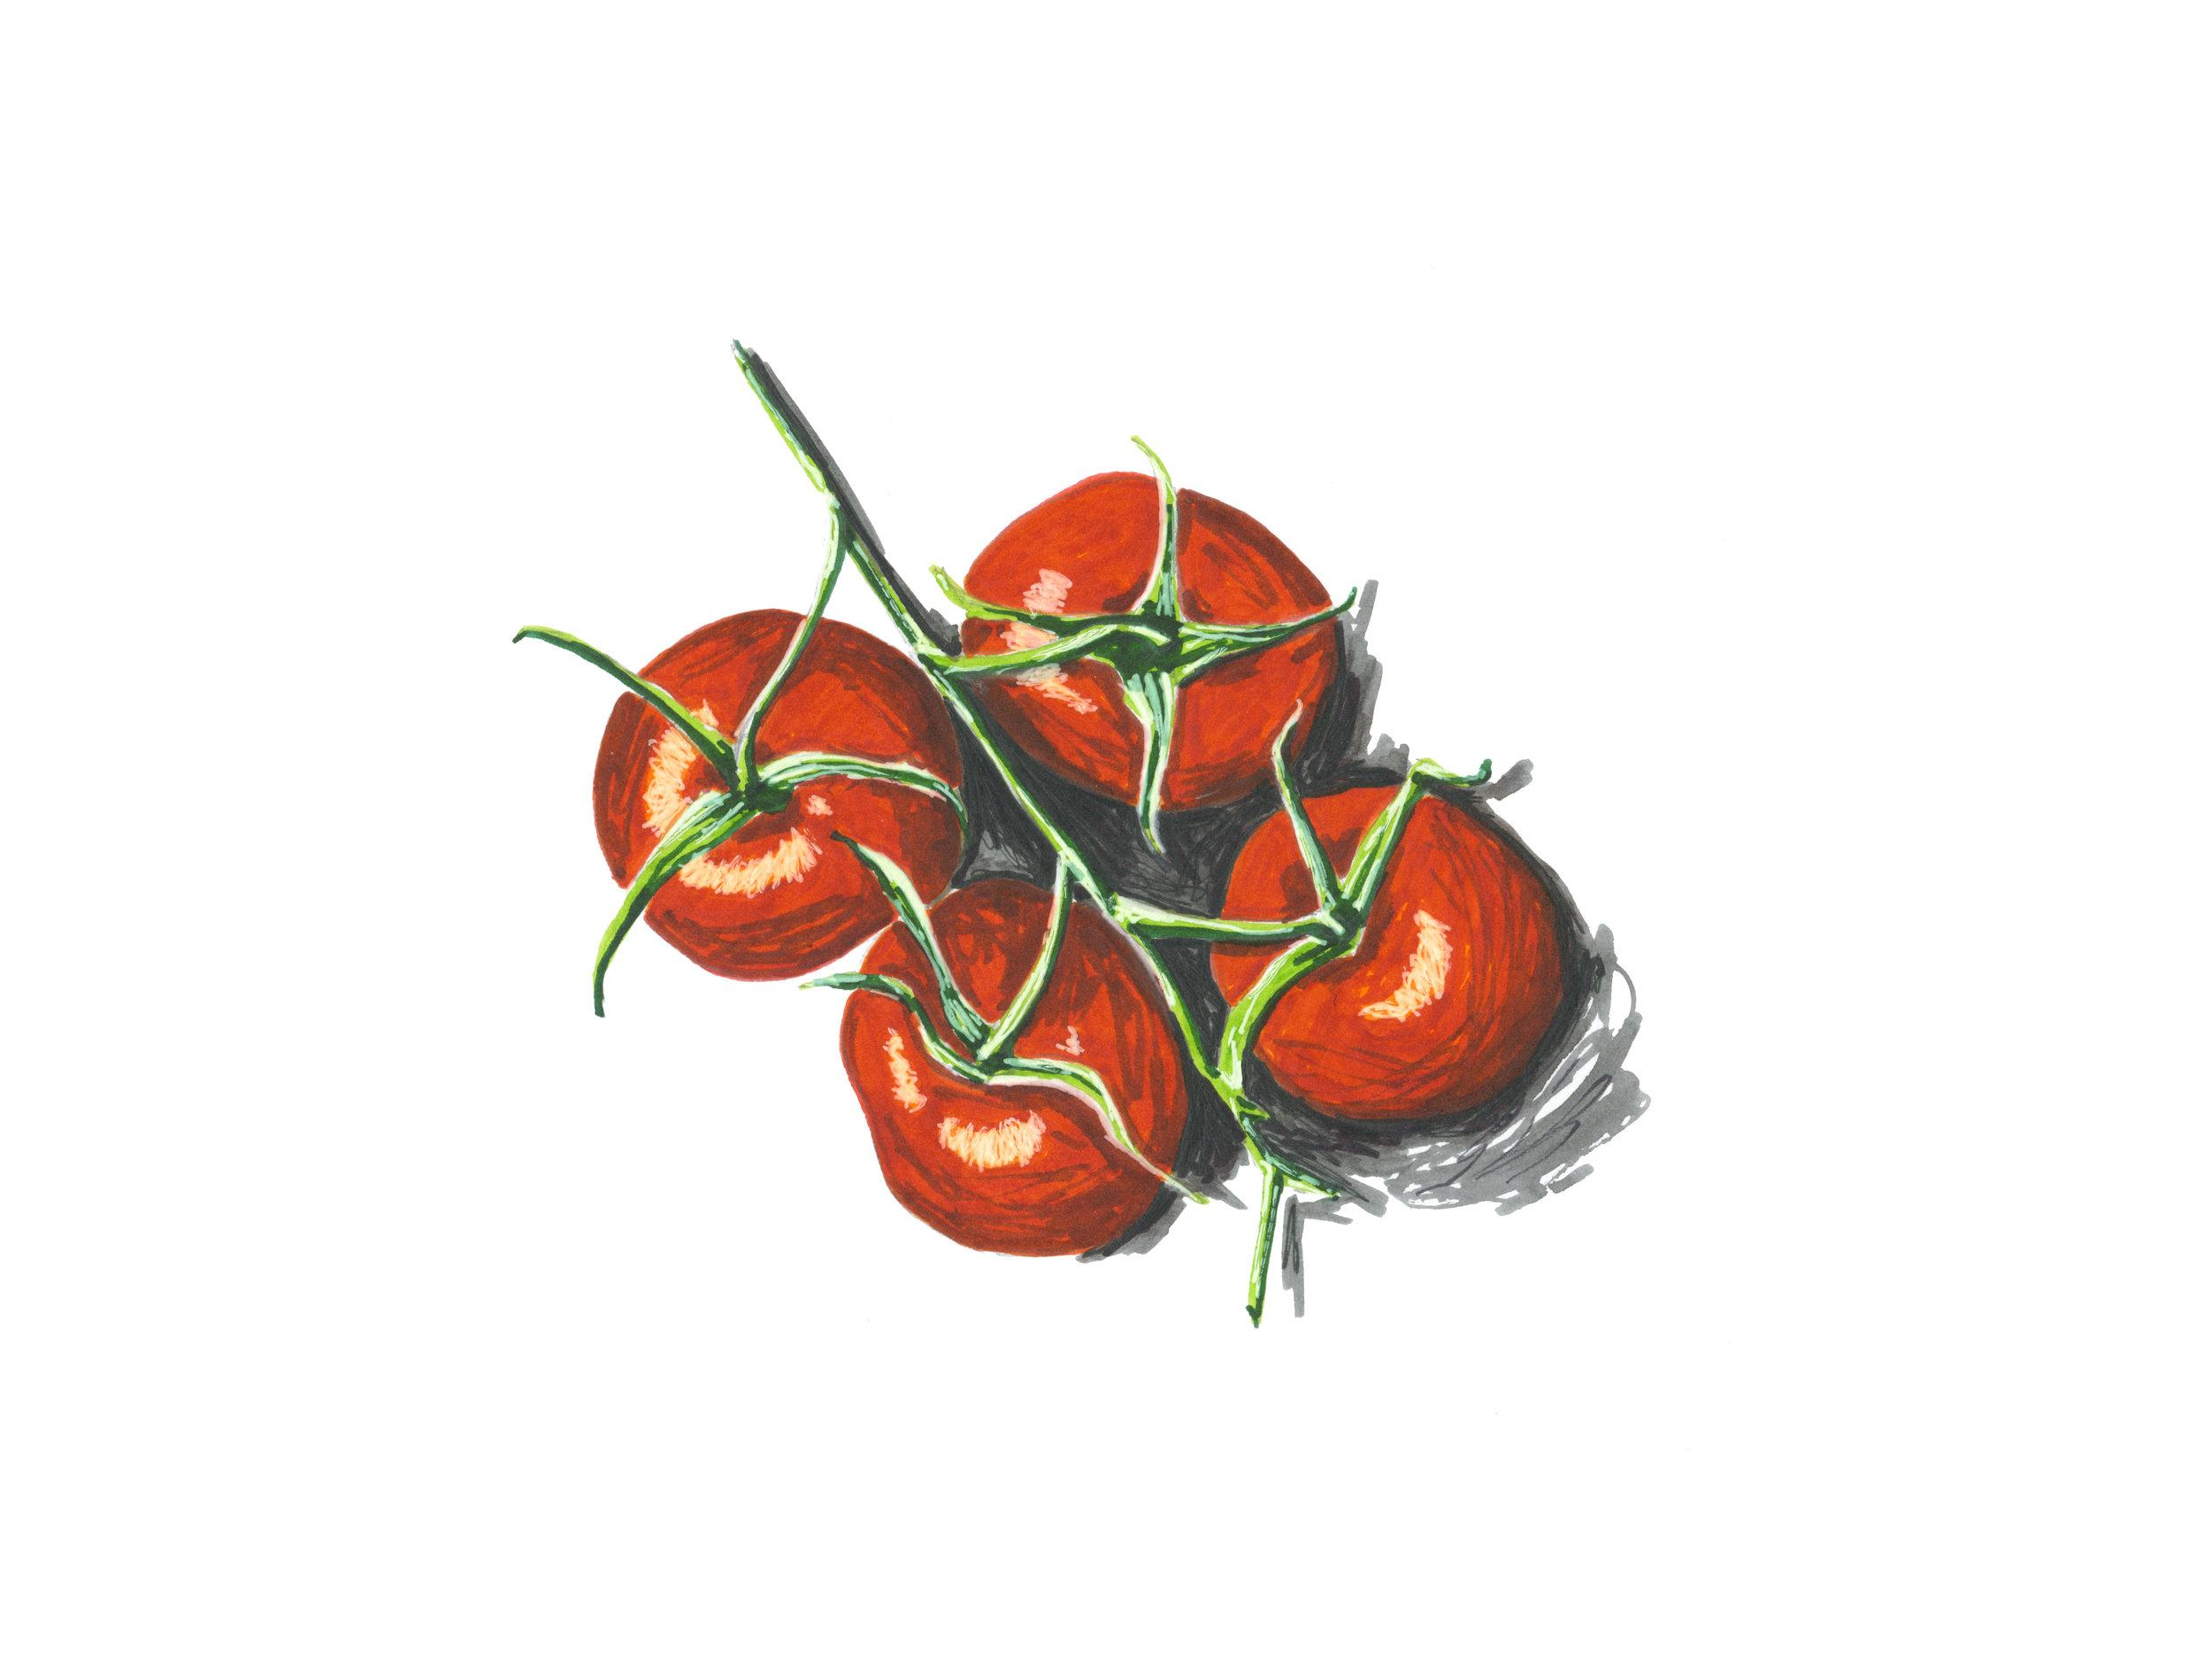 tomatoes-on-the-vine_website.jpg